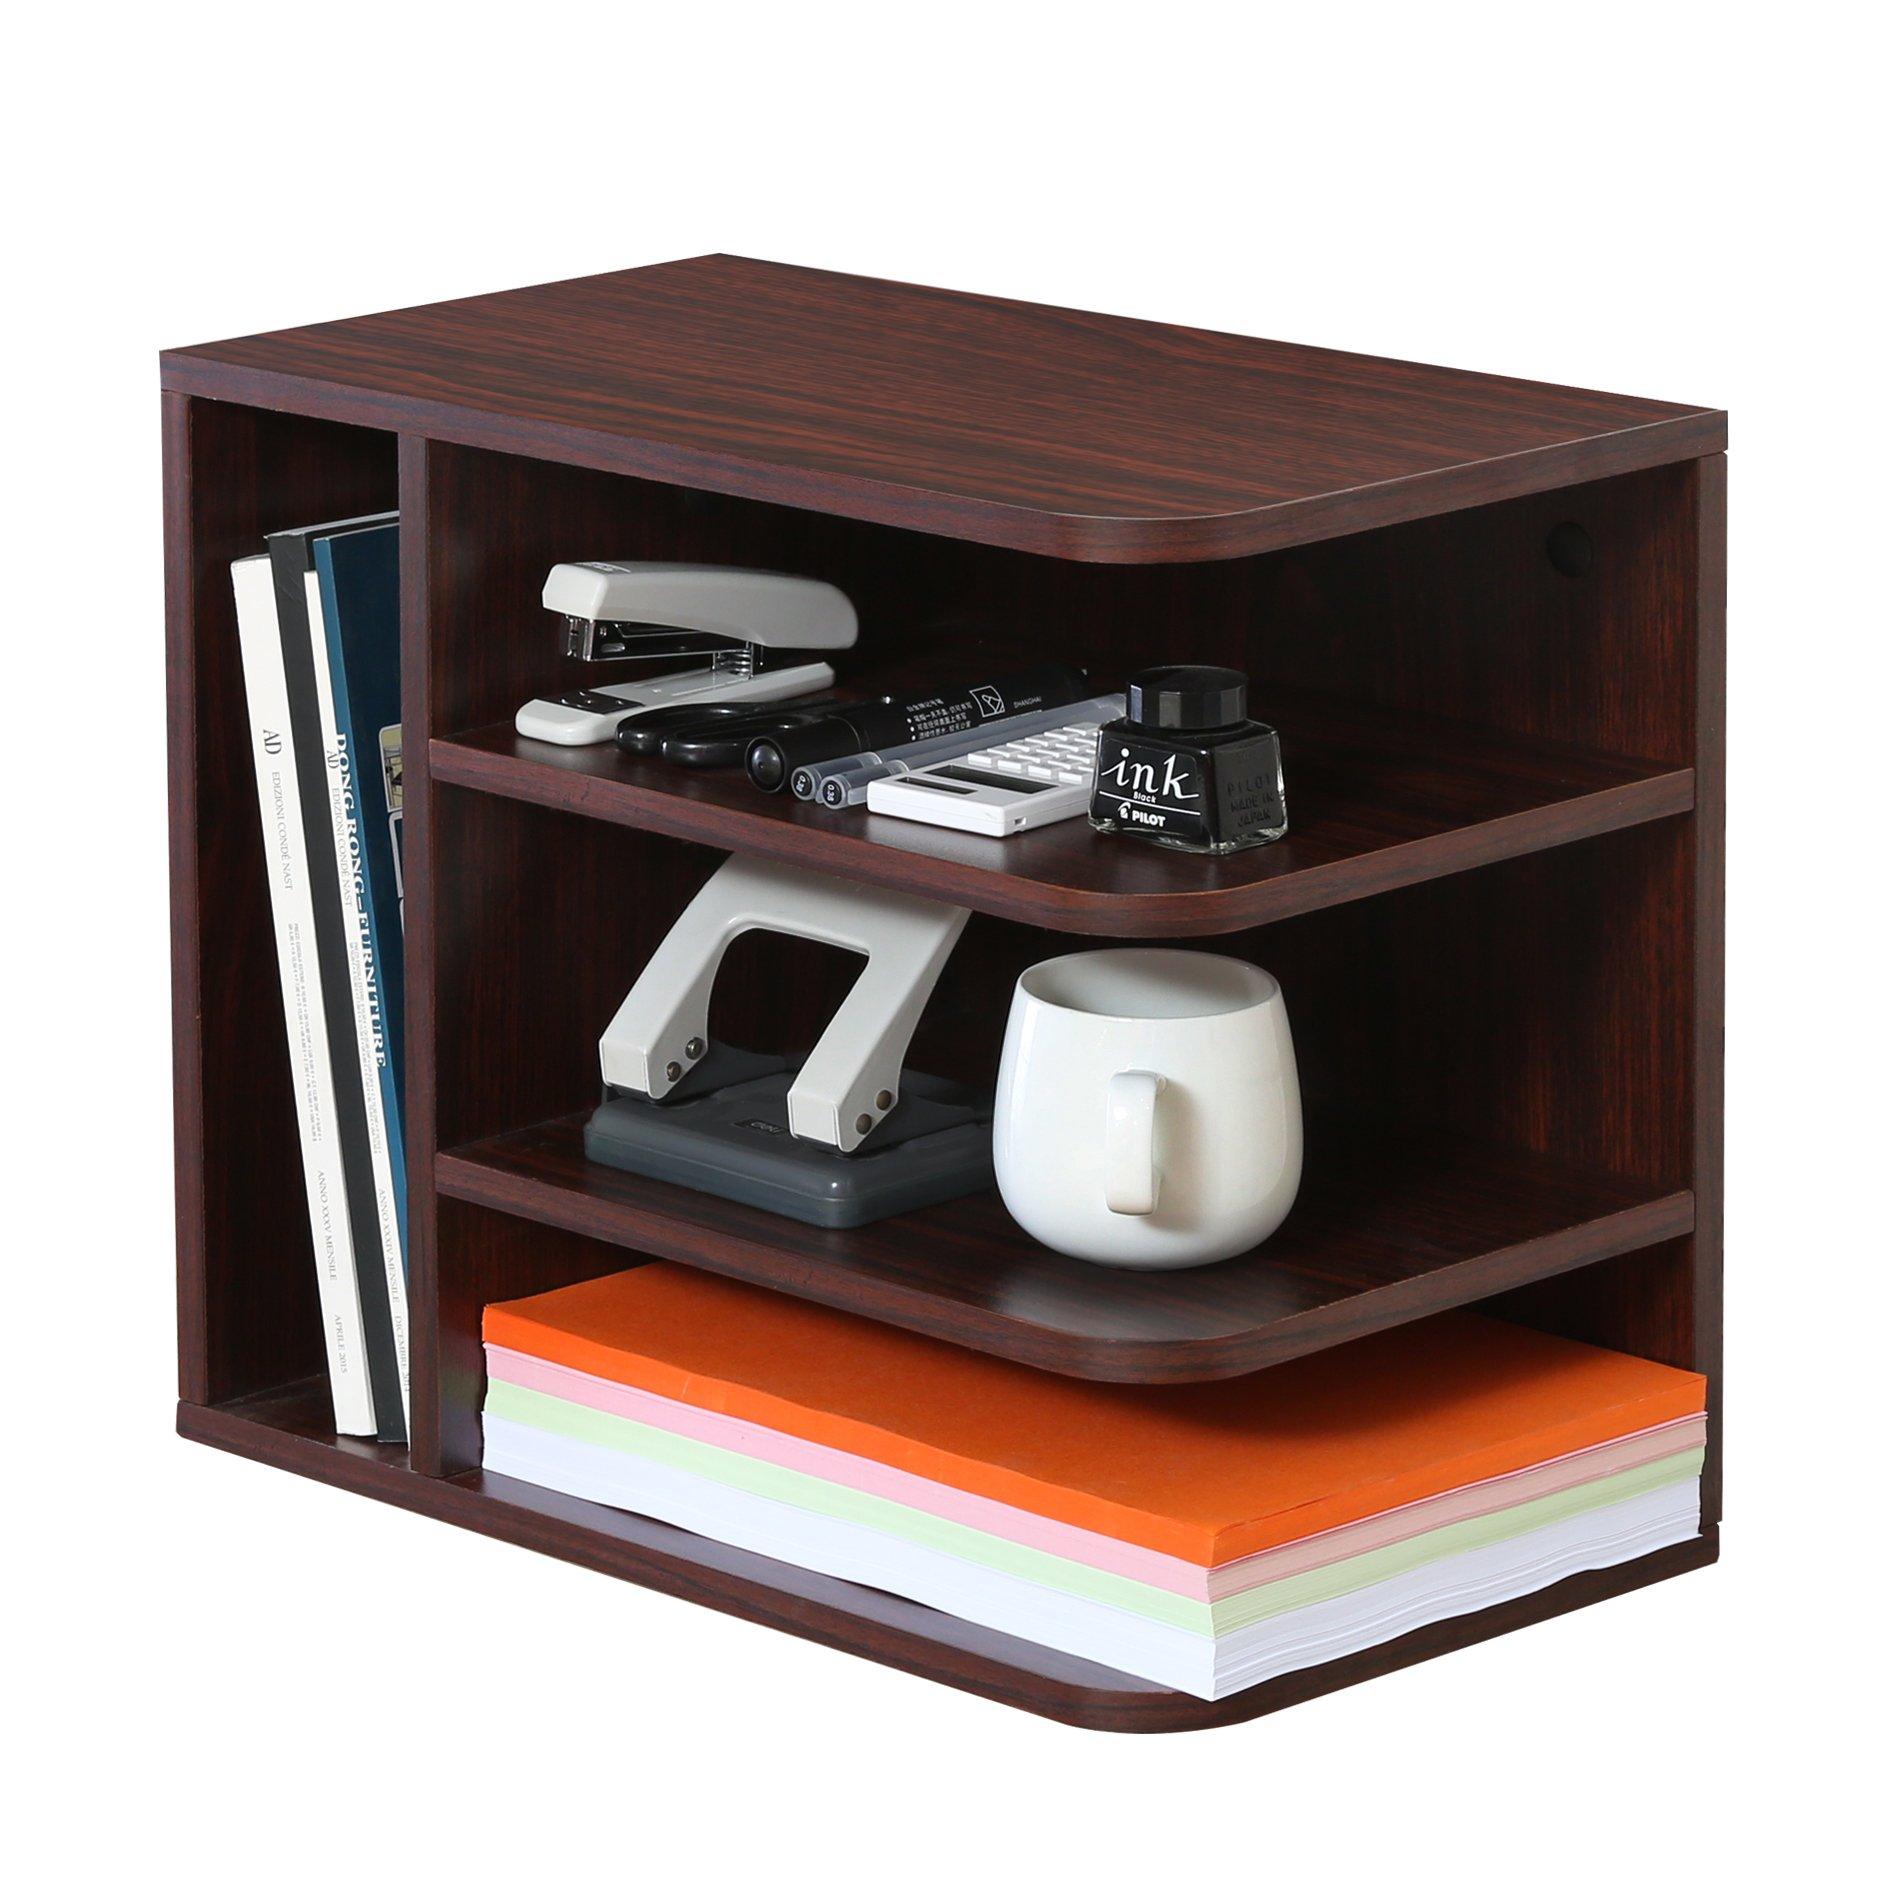 Homury Wood Desk Organizer Desktop File Mail Paper Letter Holder Sorter Organizer Tray for Office and Home,Brown